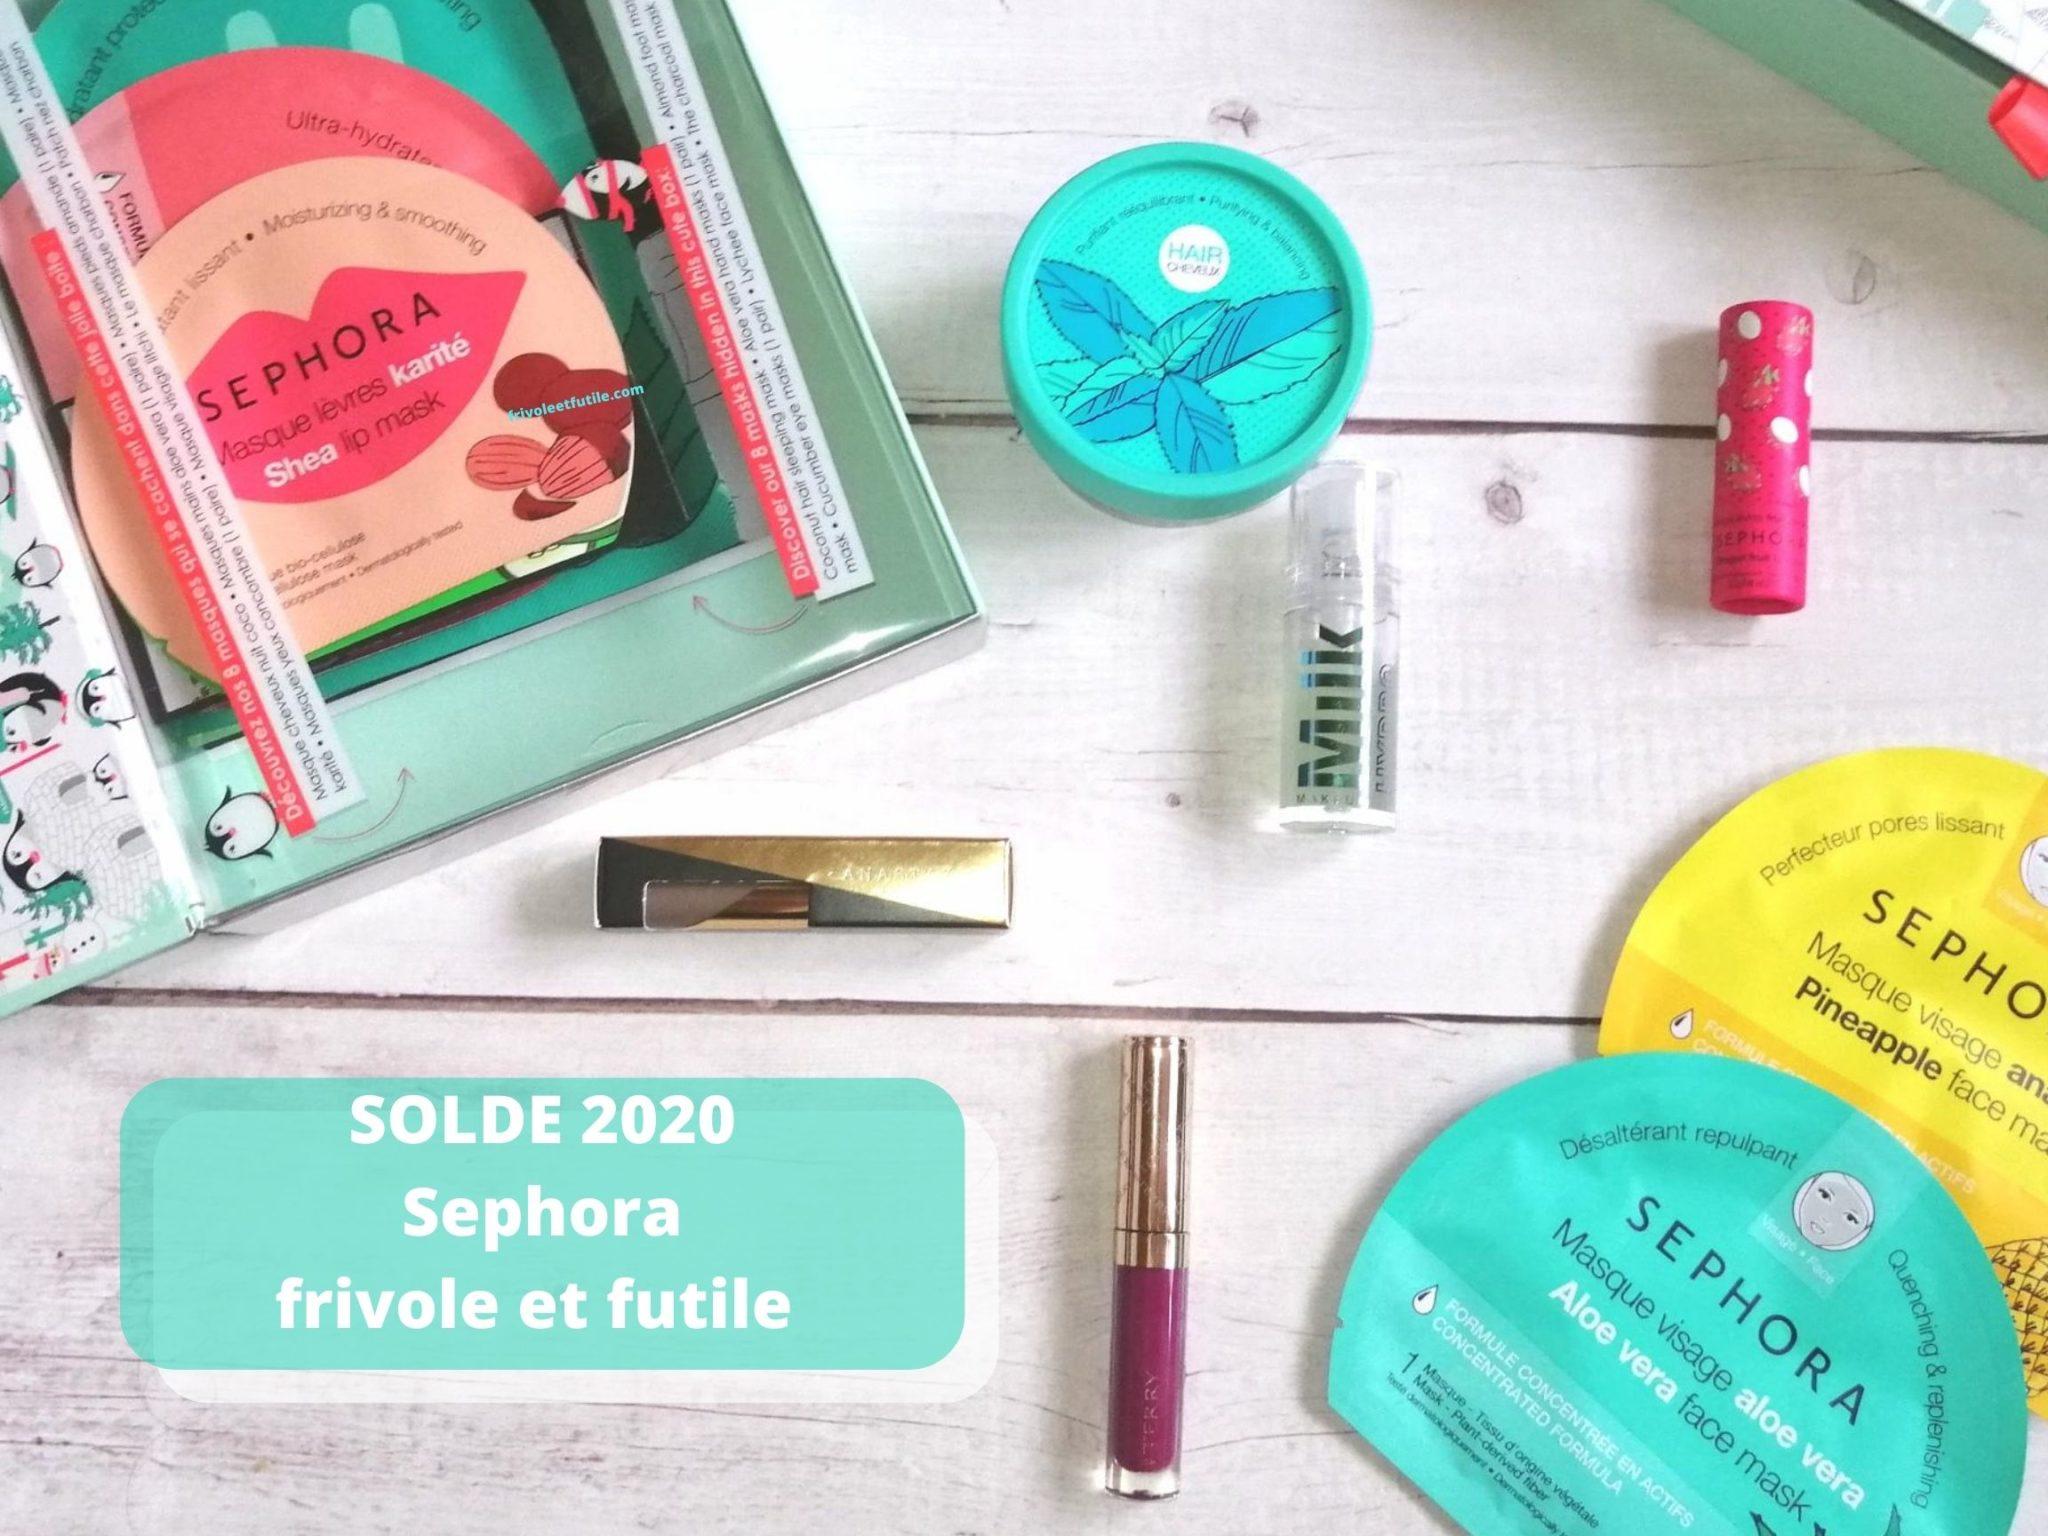 Sephora SOLDE 2020 blog frivole et futile